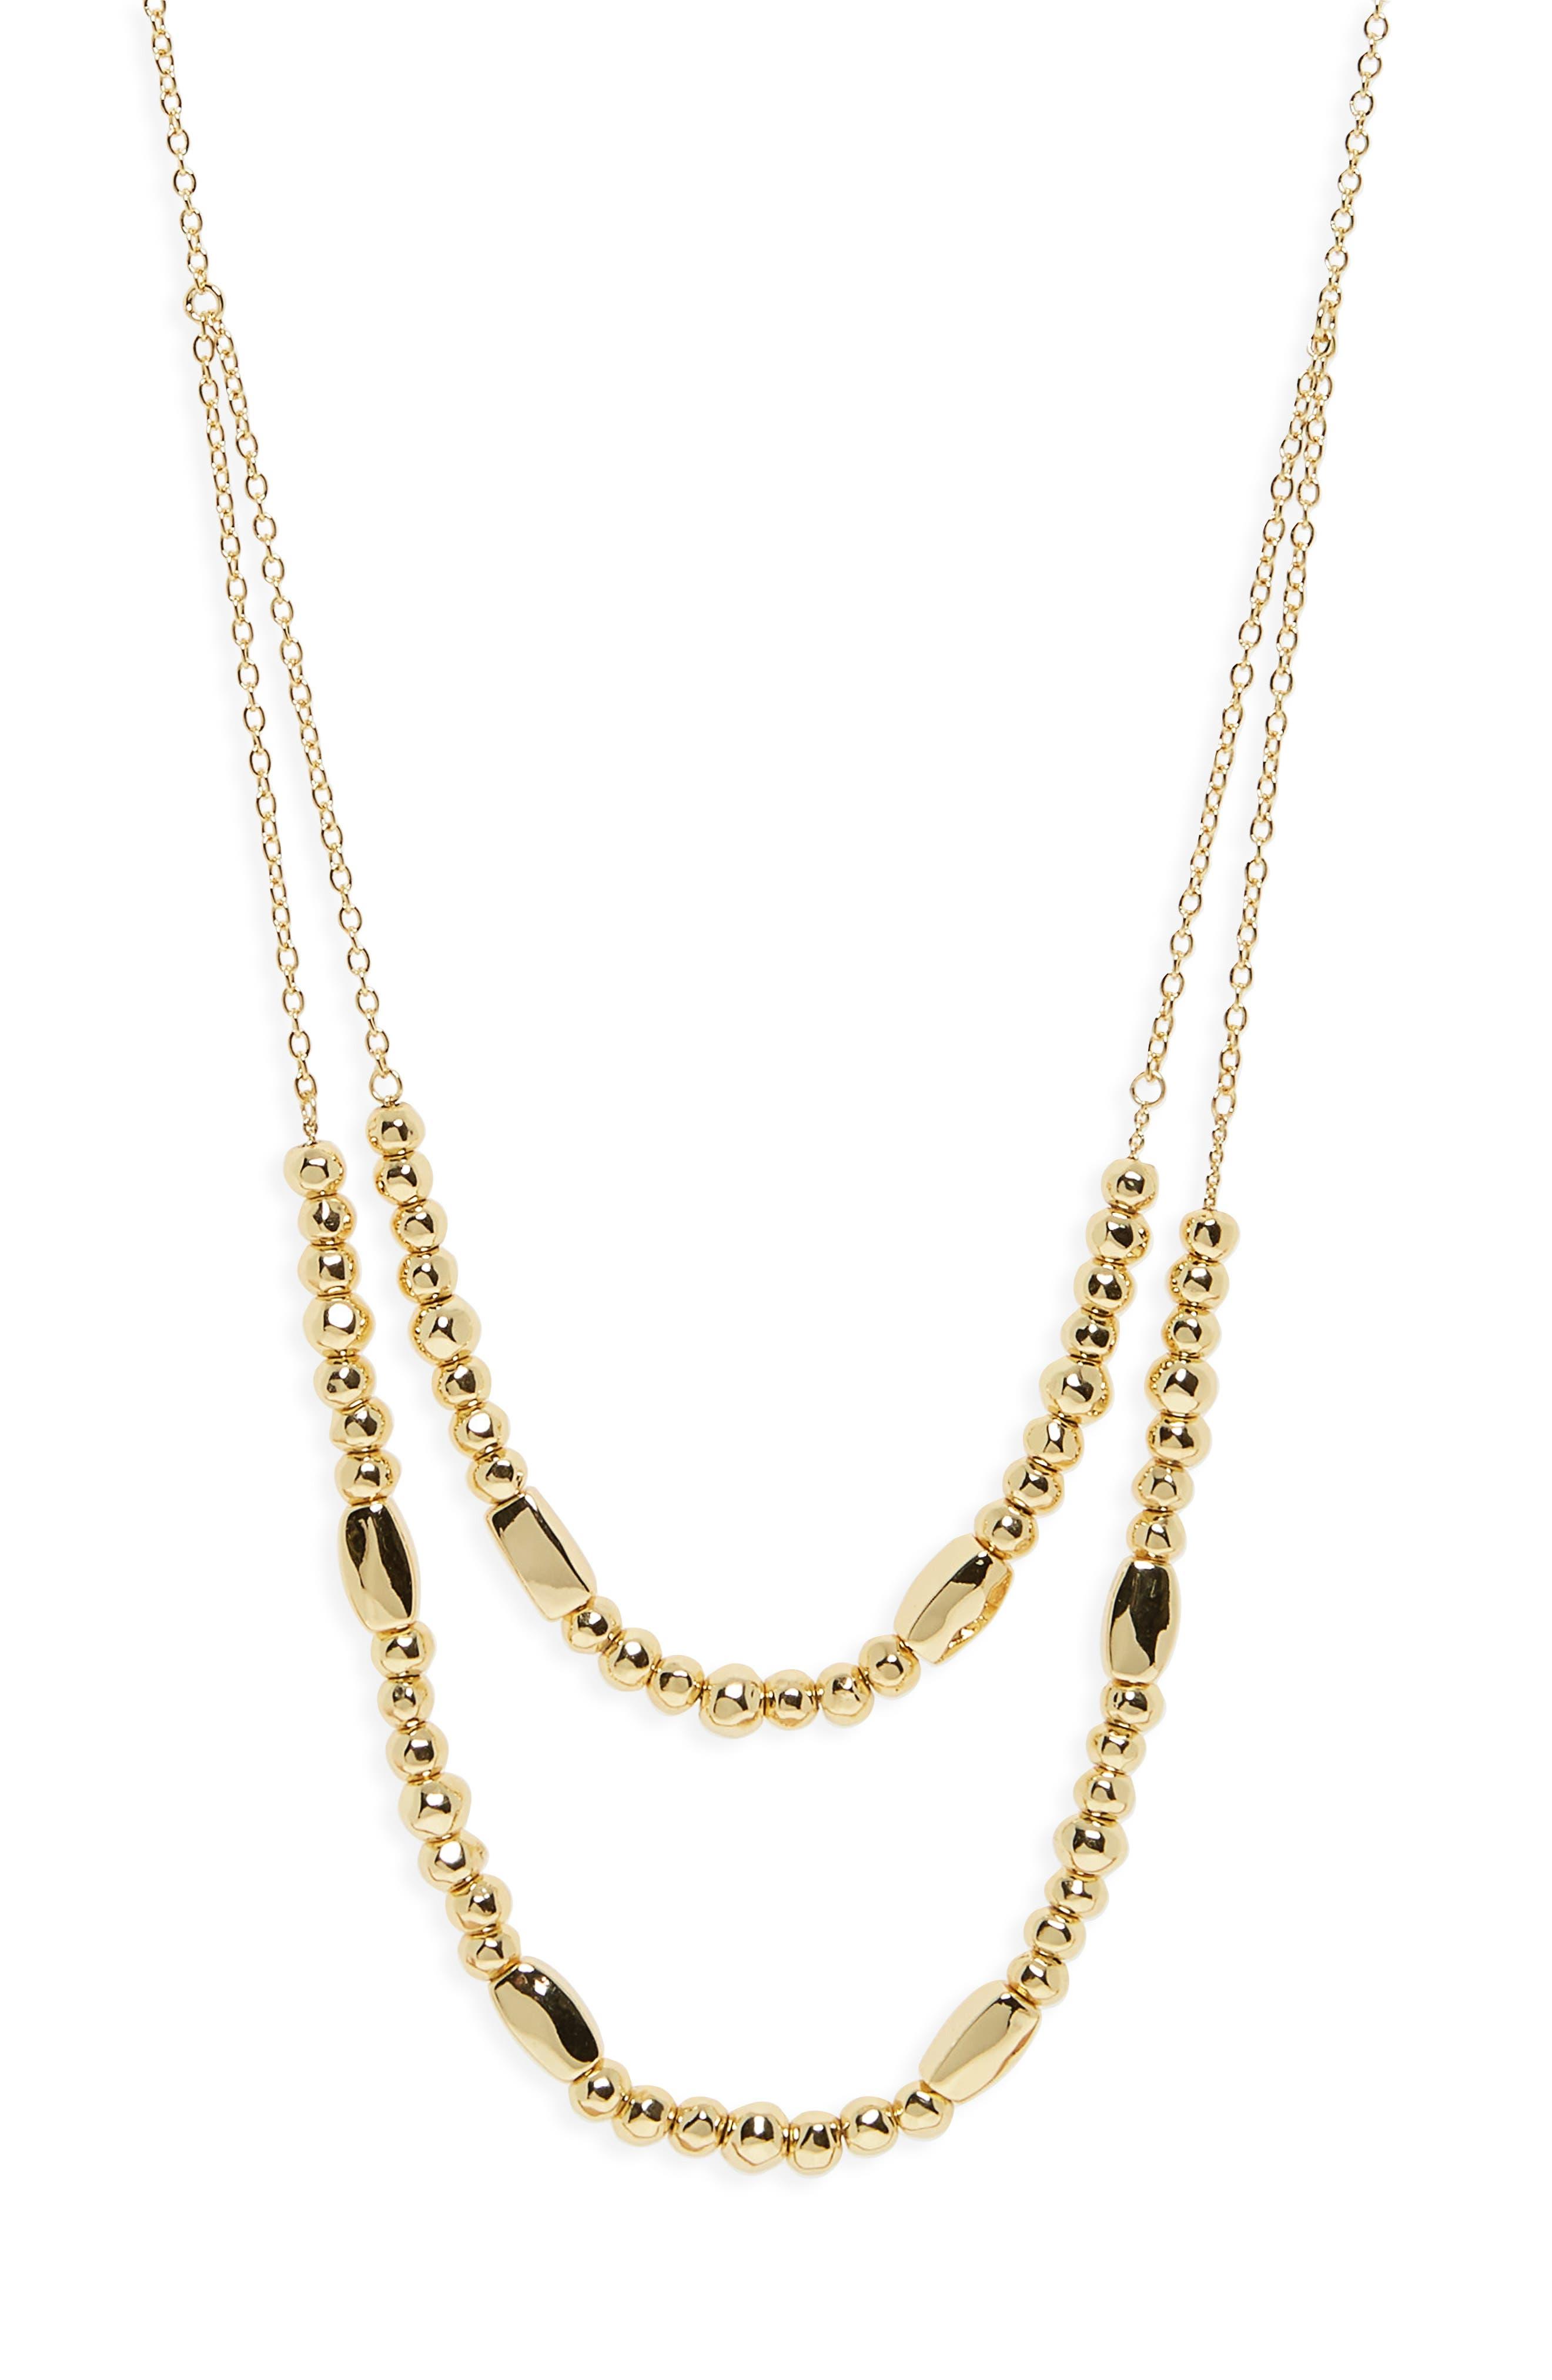 GORJANA, Kellen Adjustable Layer Necklace, Alternate thumbnail 2, color, GOLD